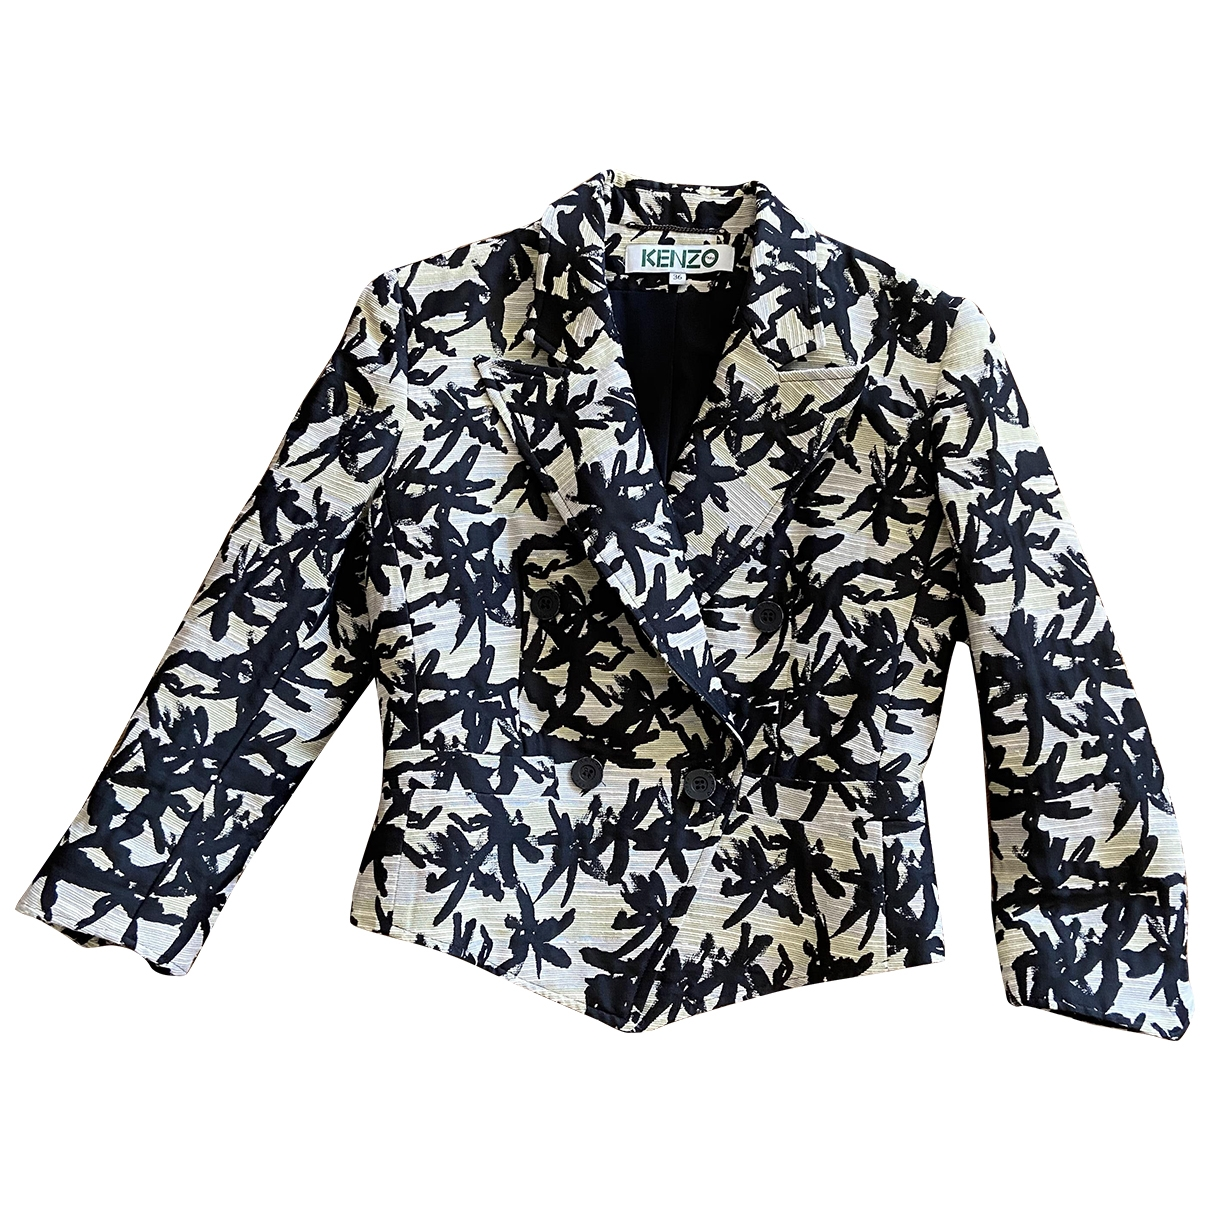 Kenzo \N Multicolour jacket for Women 36 FR